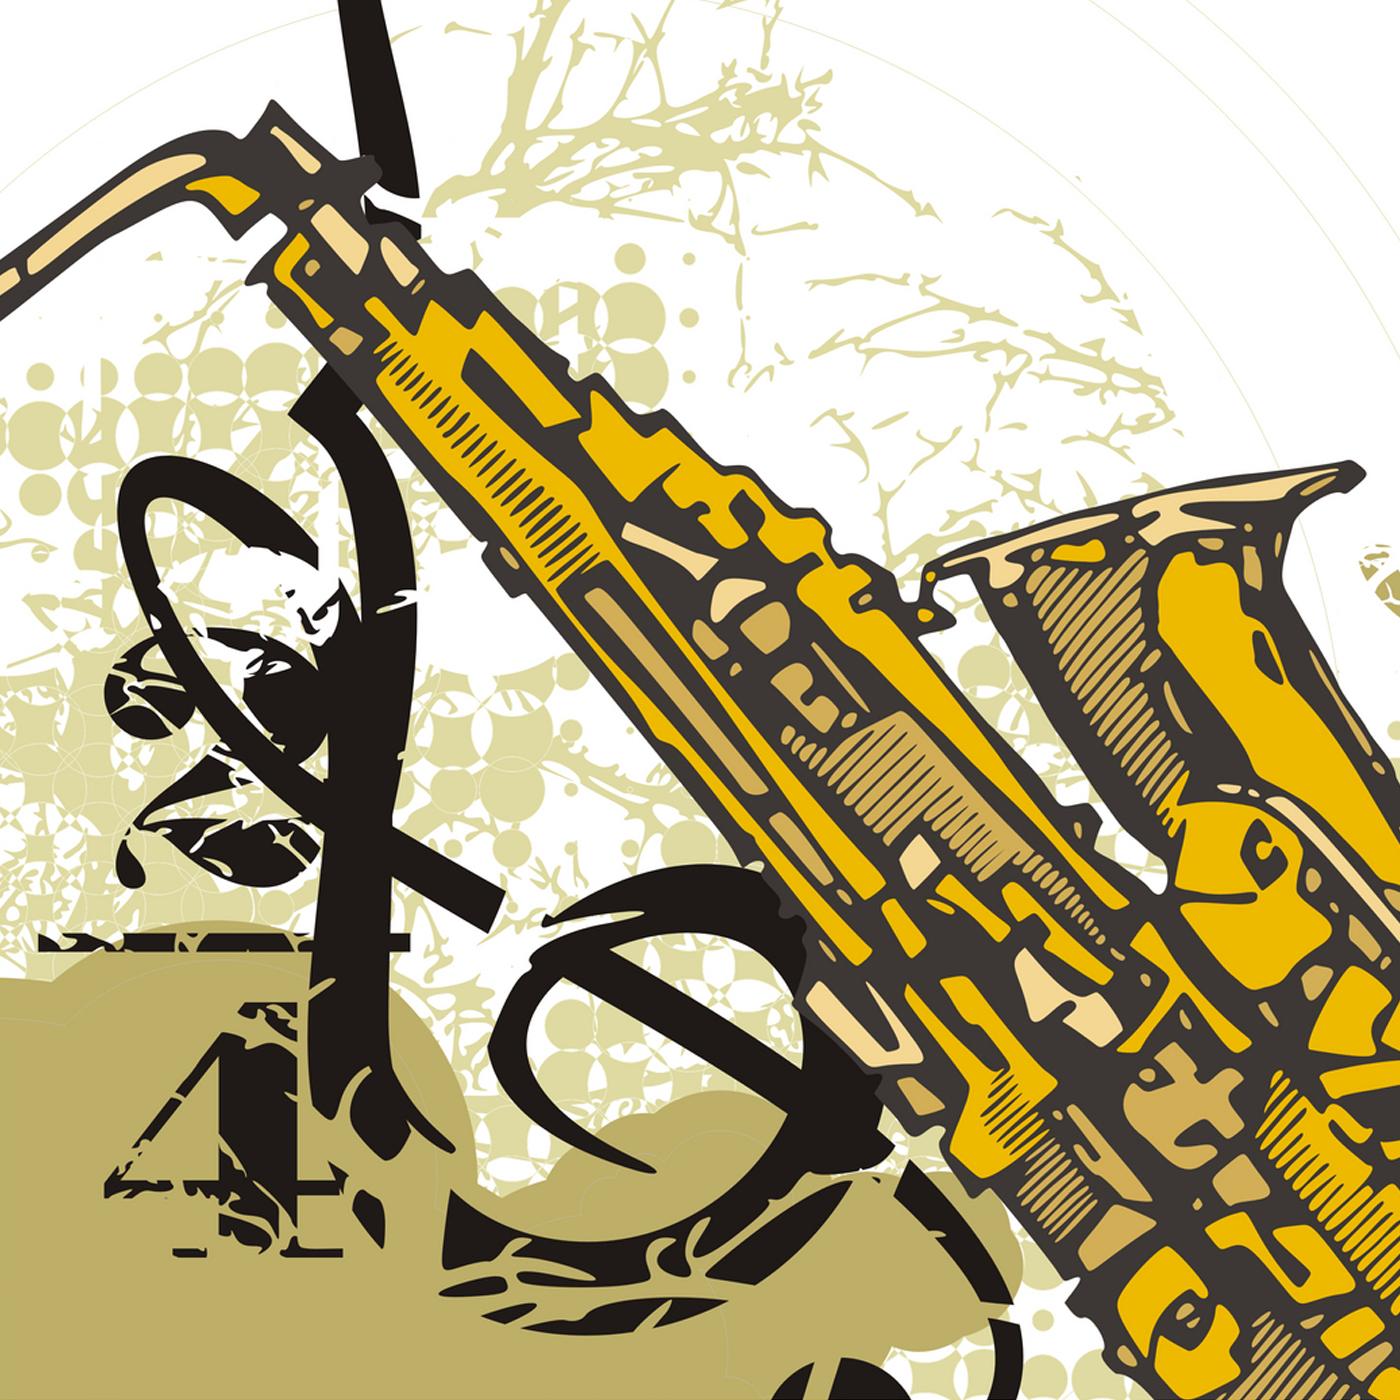 Smooth Uptempo on JAZZRADIO.com - JAZZRADIO.com - enjoy great jazz music